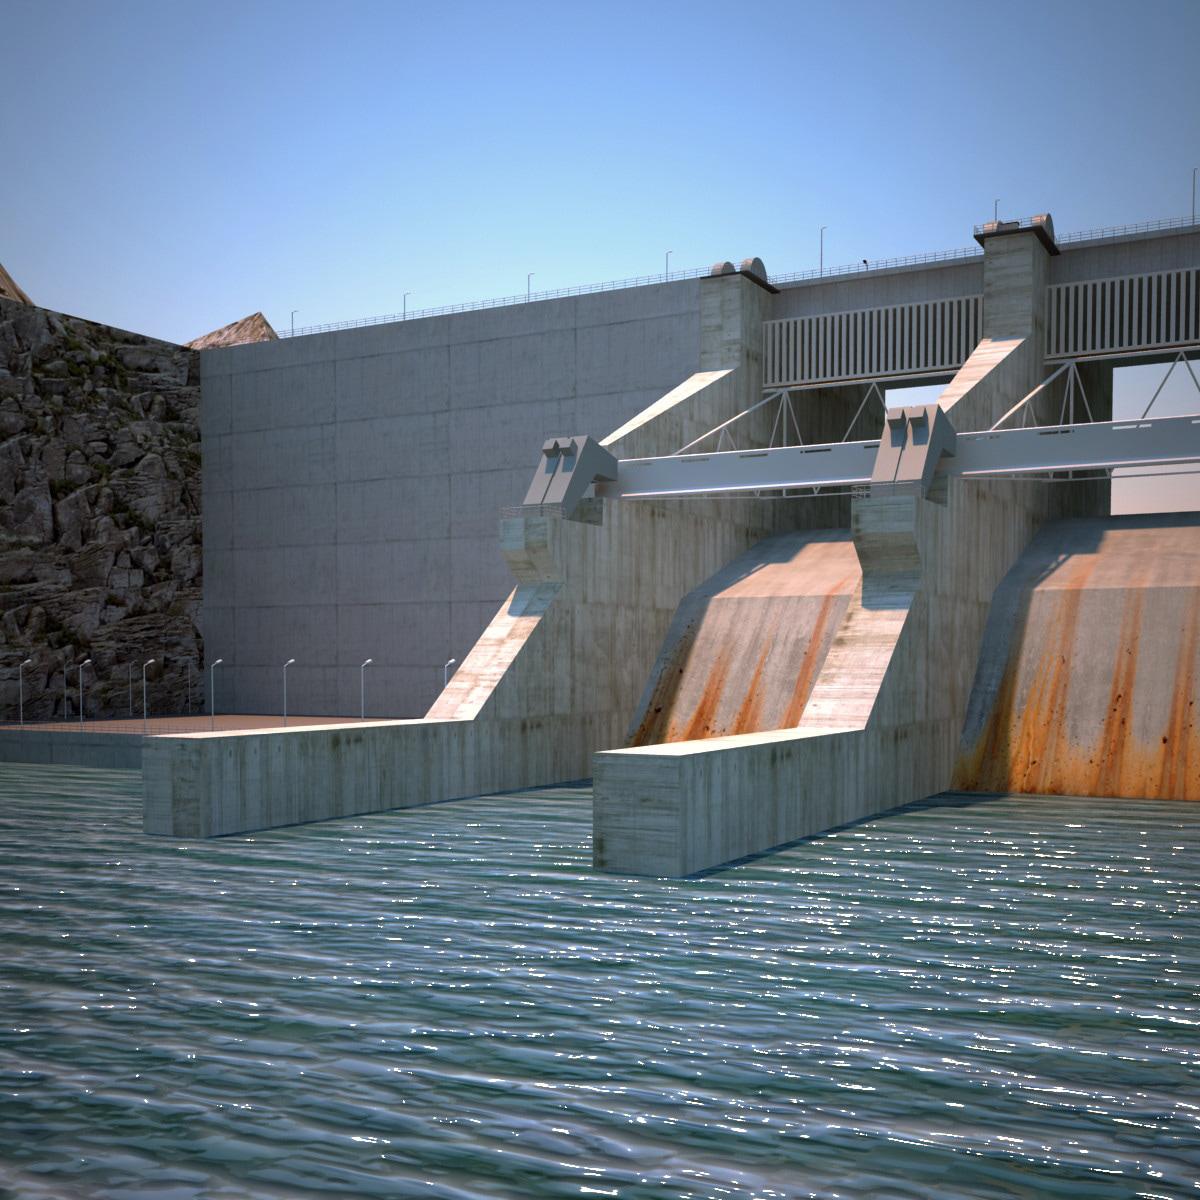 hydroelectric dam v3 3ds